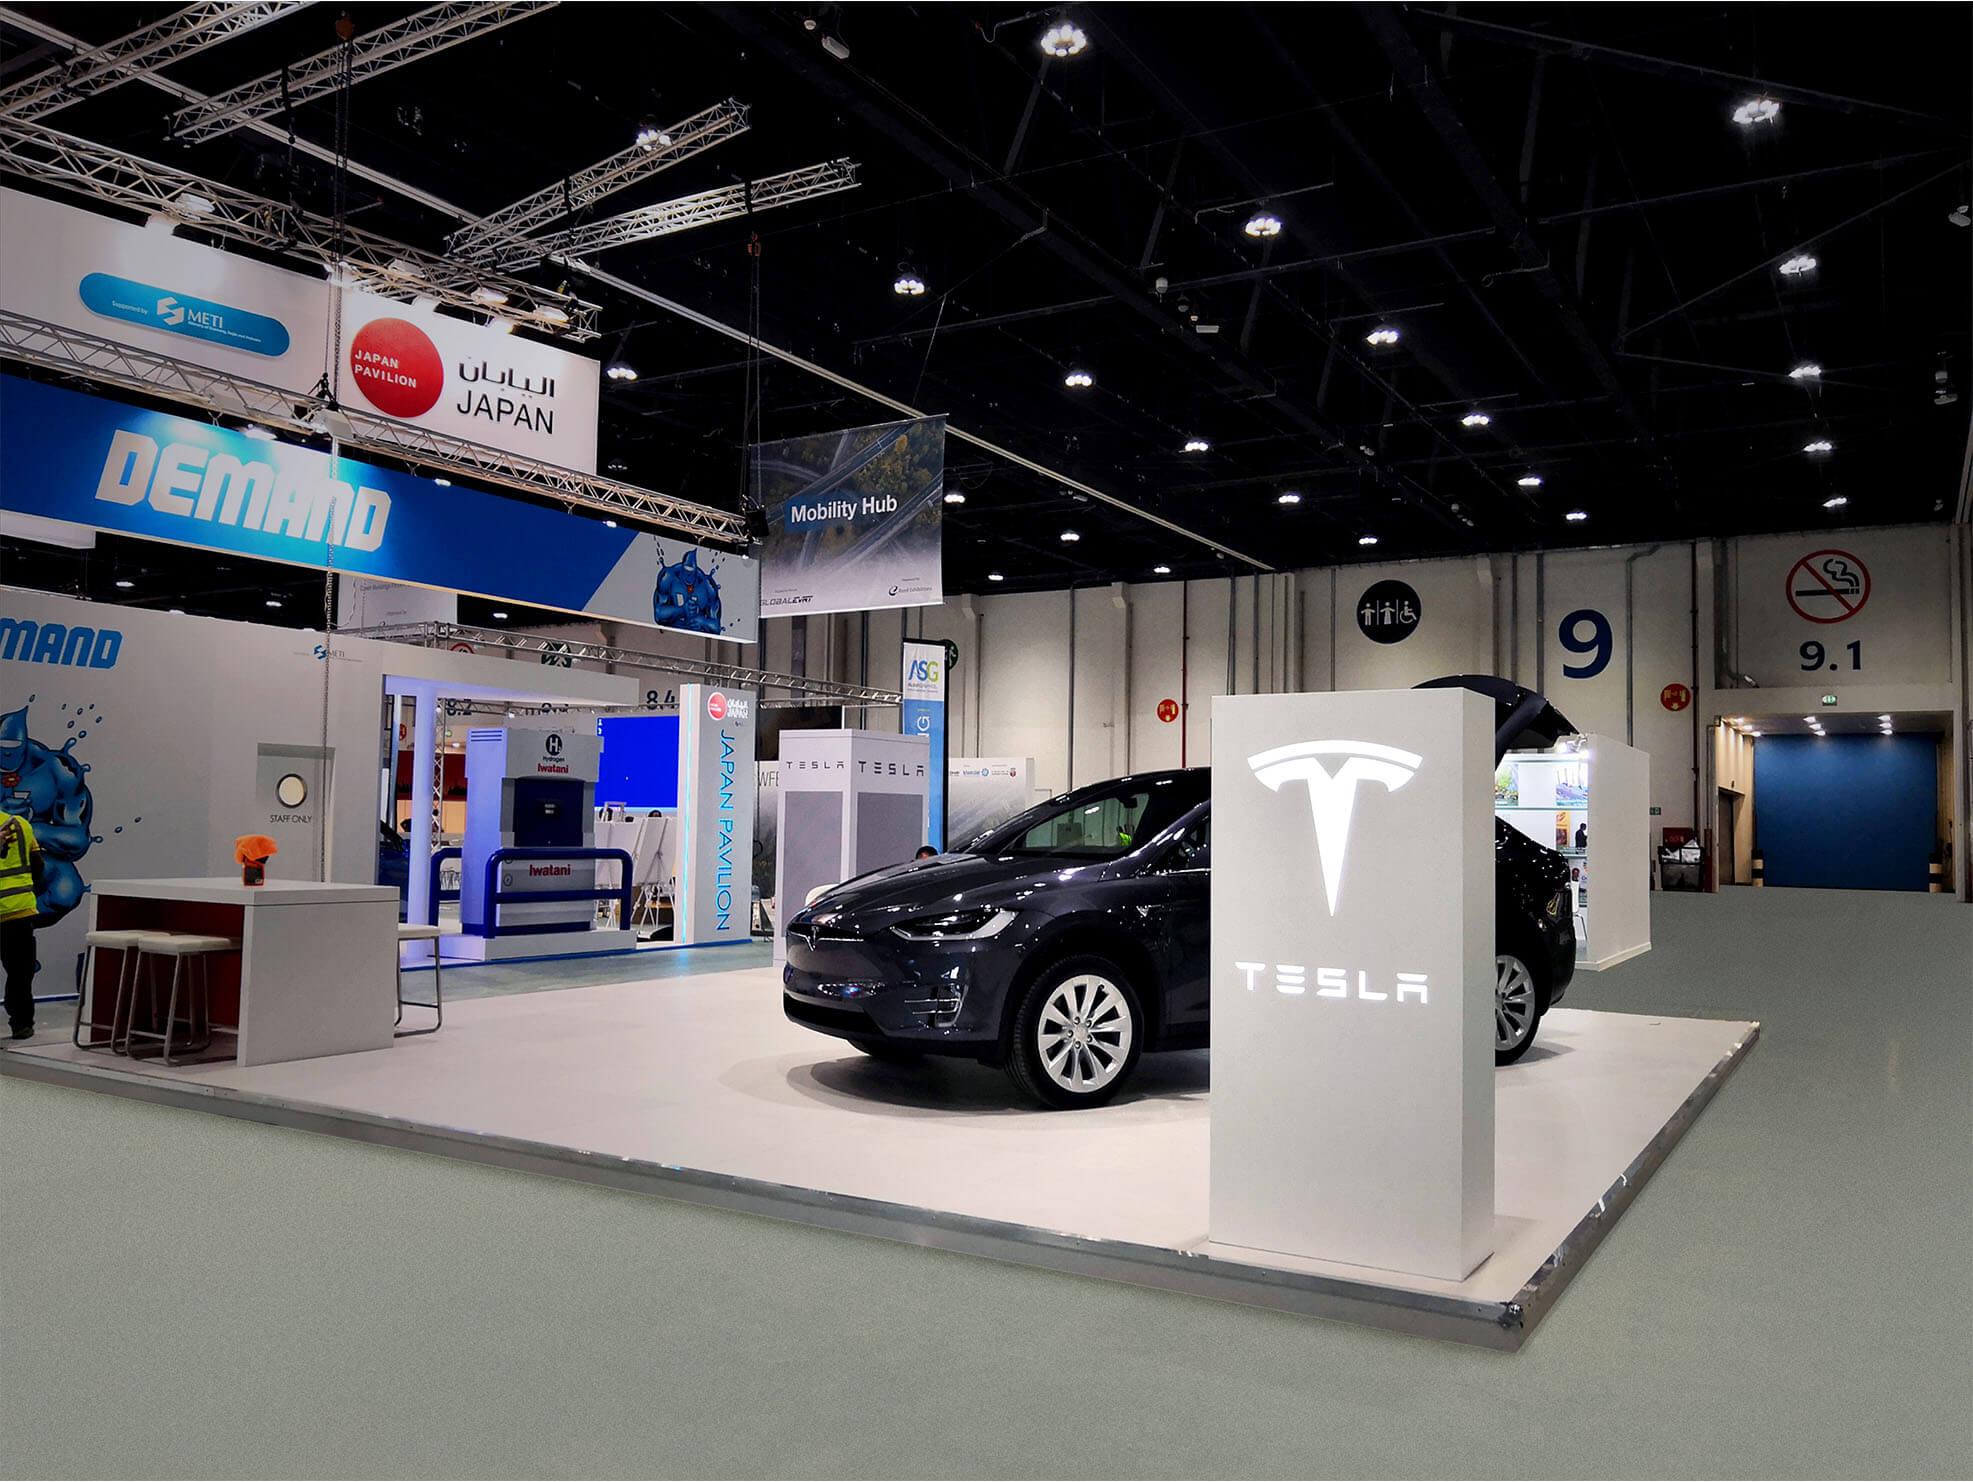 Tesla trade show booth designs